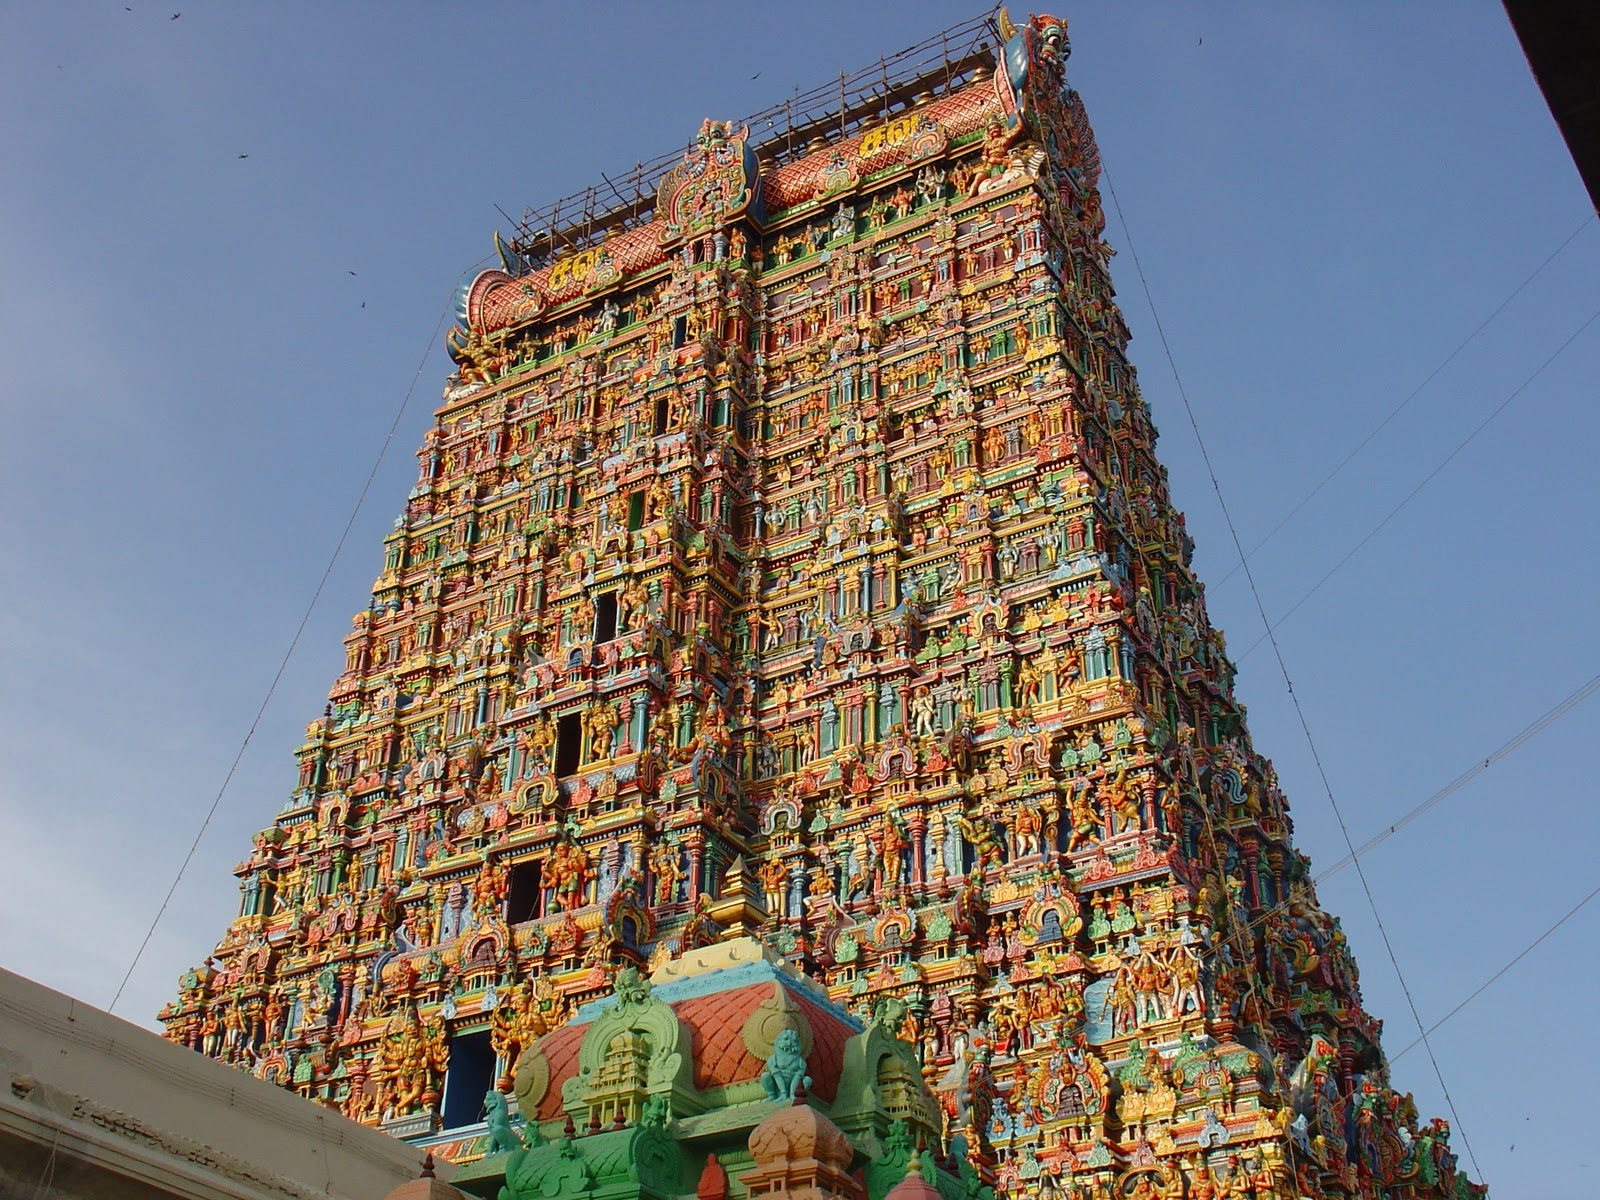 madurai meenakshi amman temple Sri meenakshi temple: meenakshi amman temple - madurai - see 3,214 traveler reviews, 2,154 candid photos, and great deals for madurai, india, at tripadvisor.